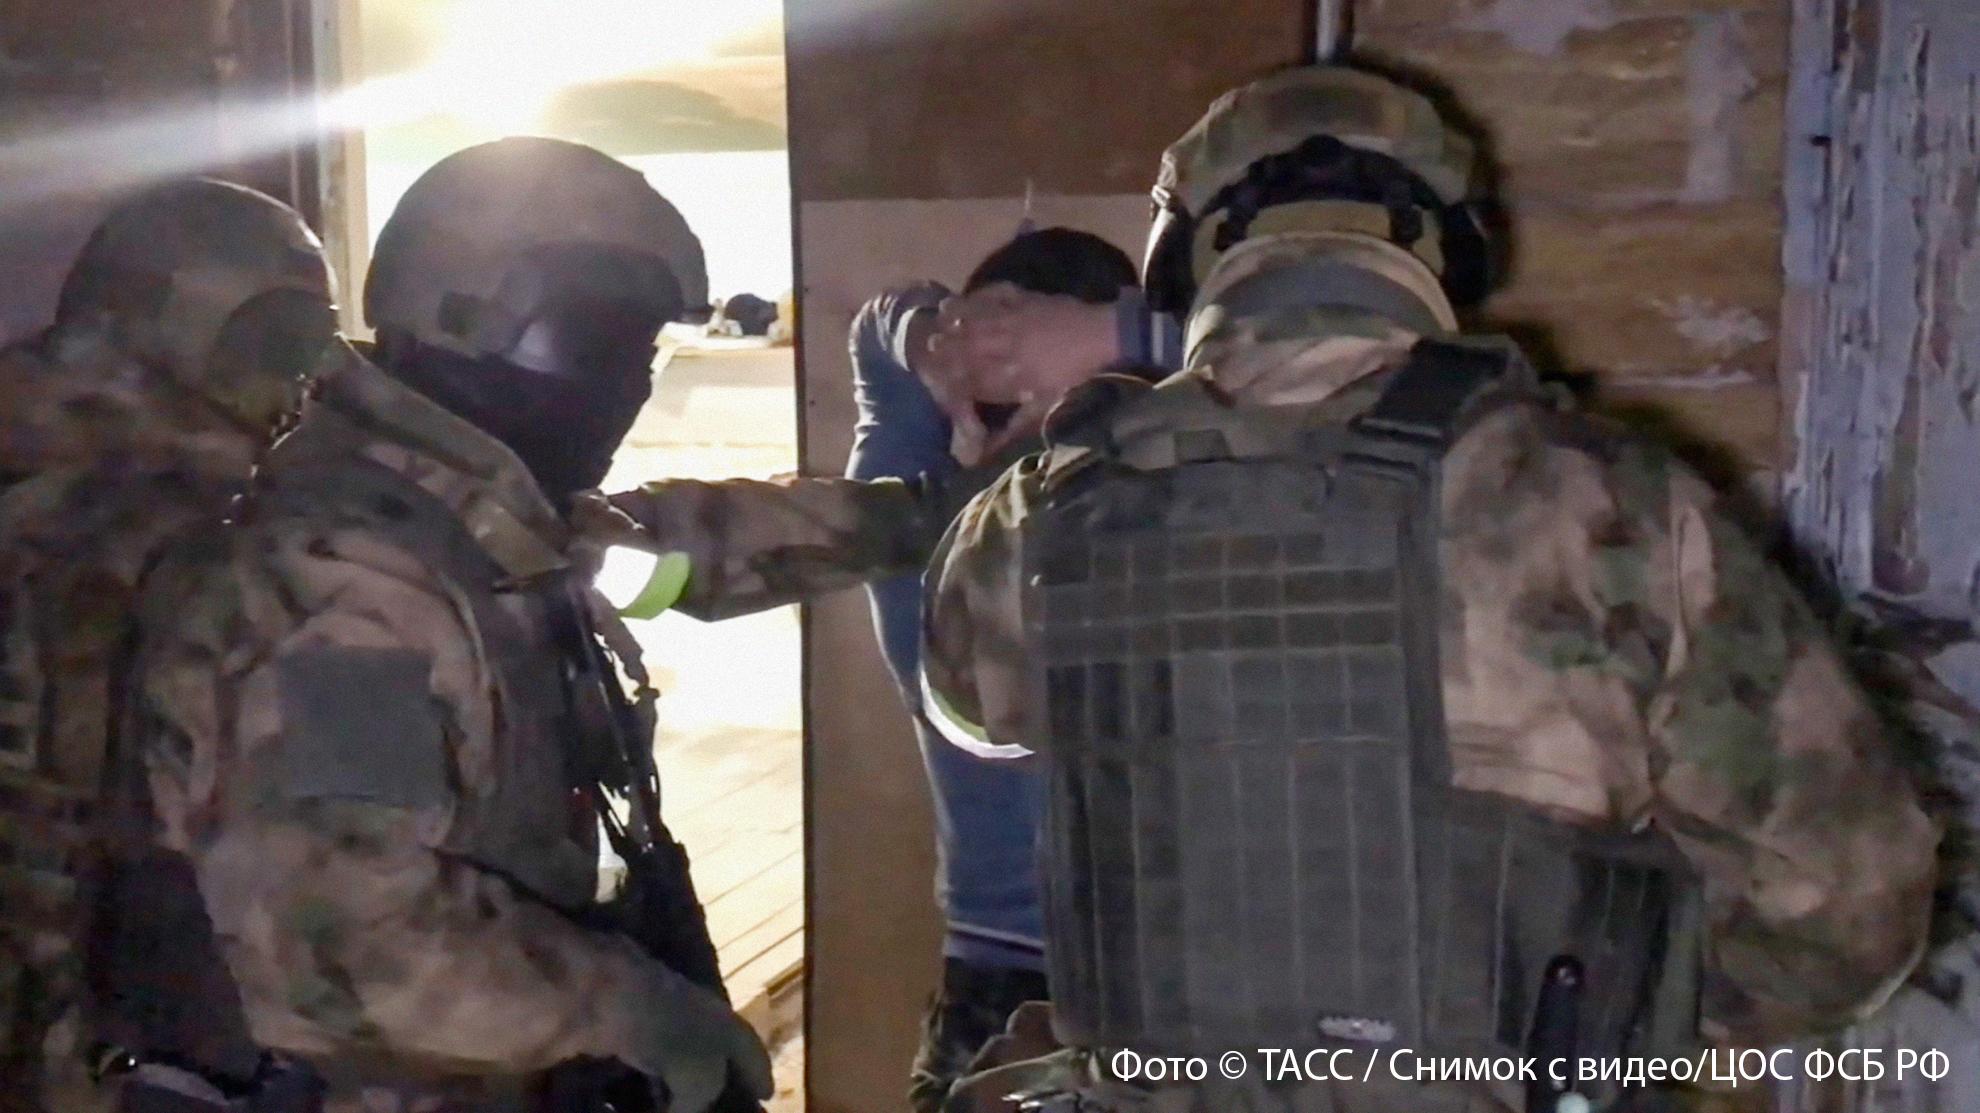 <p>Фото © ТАСС / Снимок из видео / ЦОС ФСБ РФ</p>